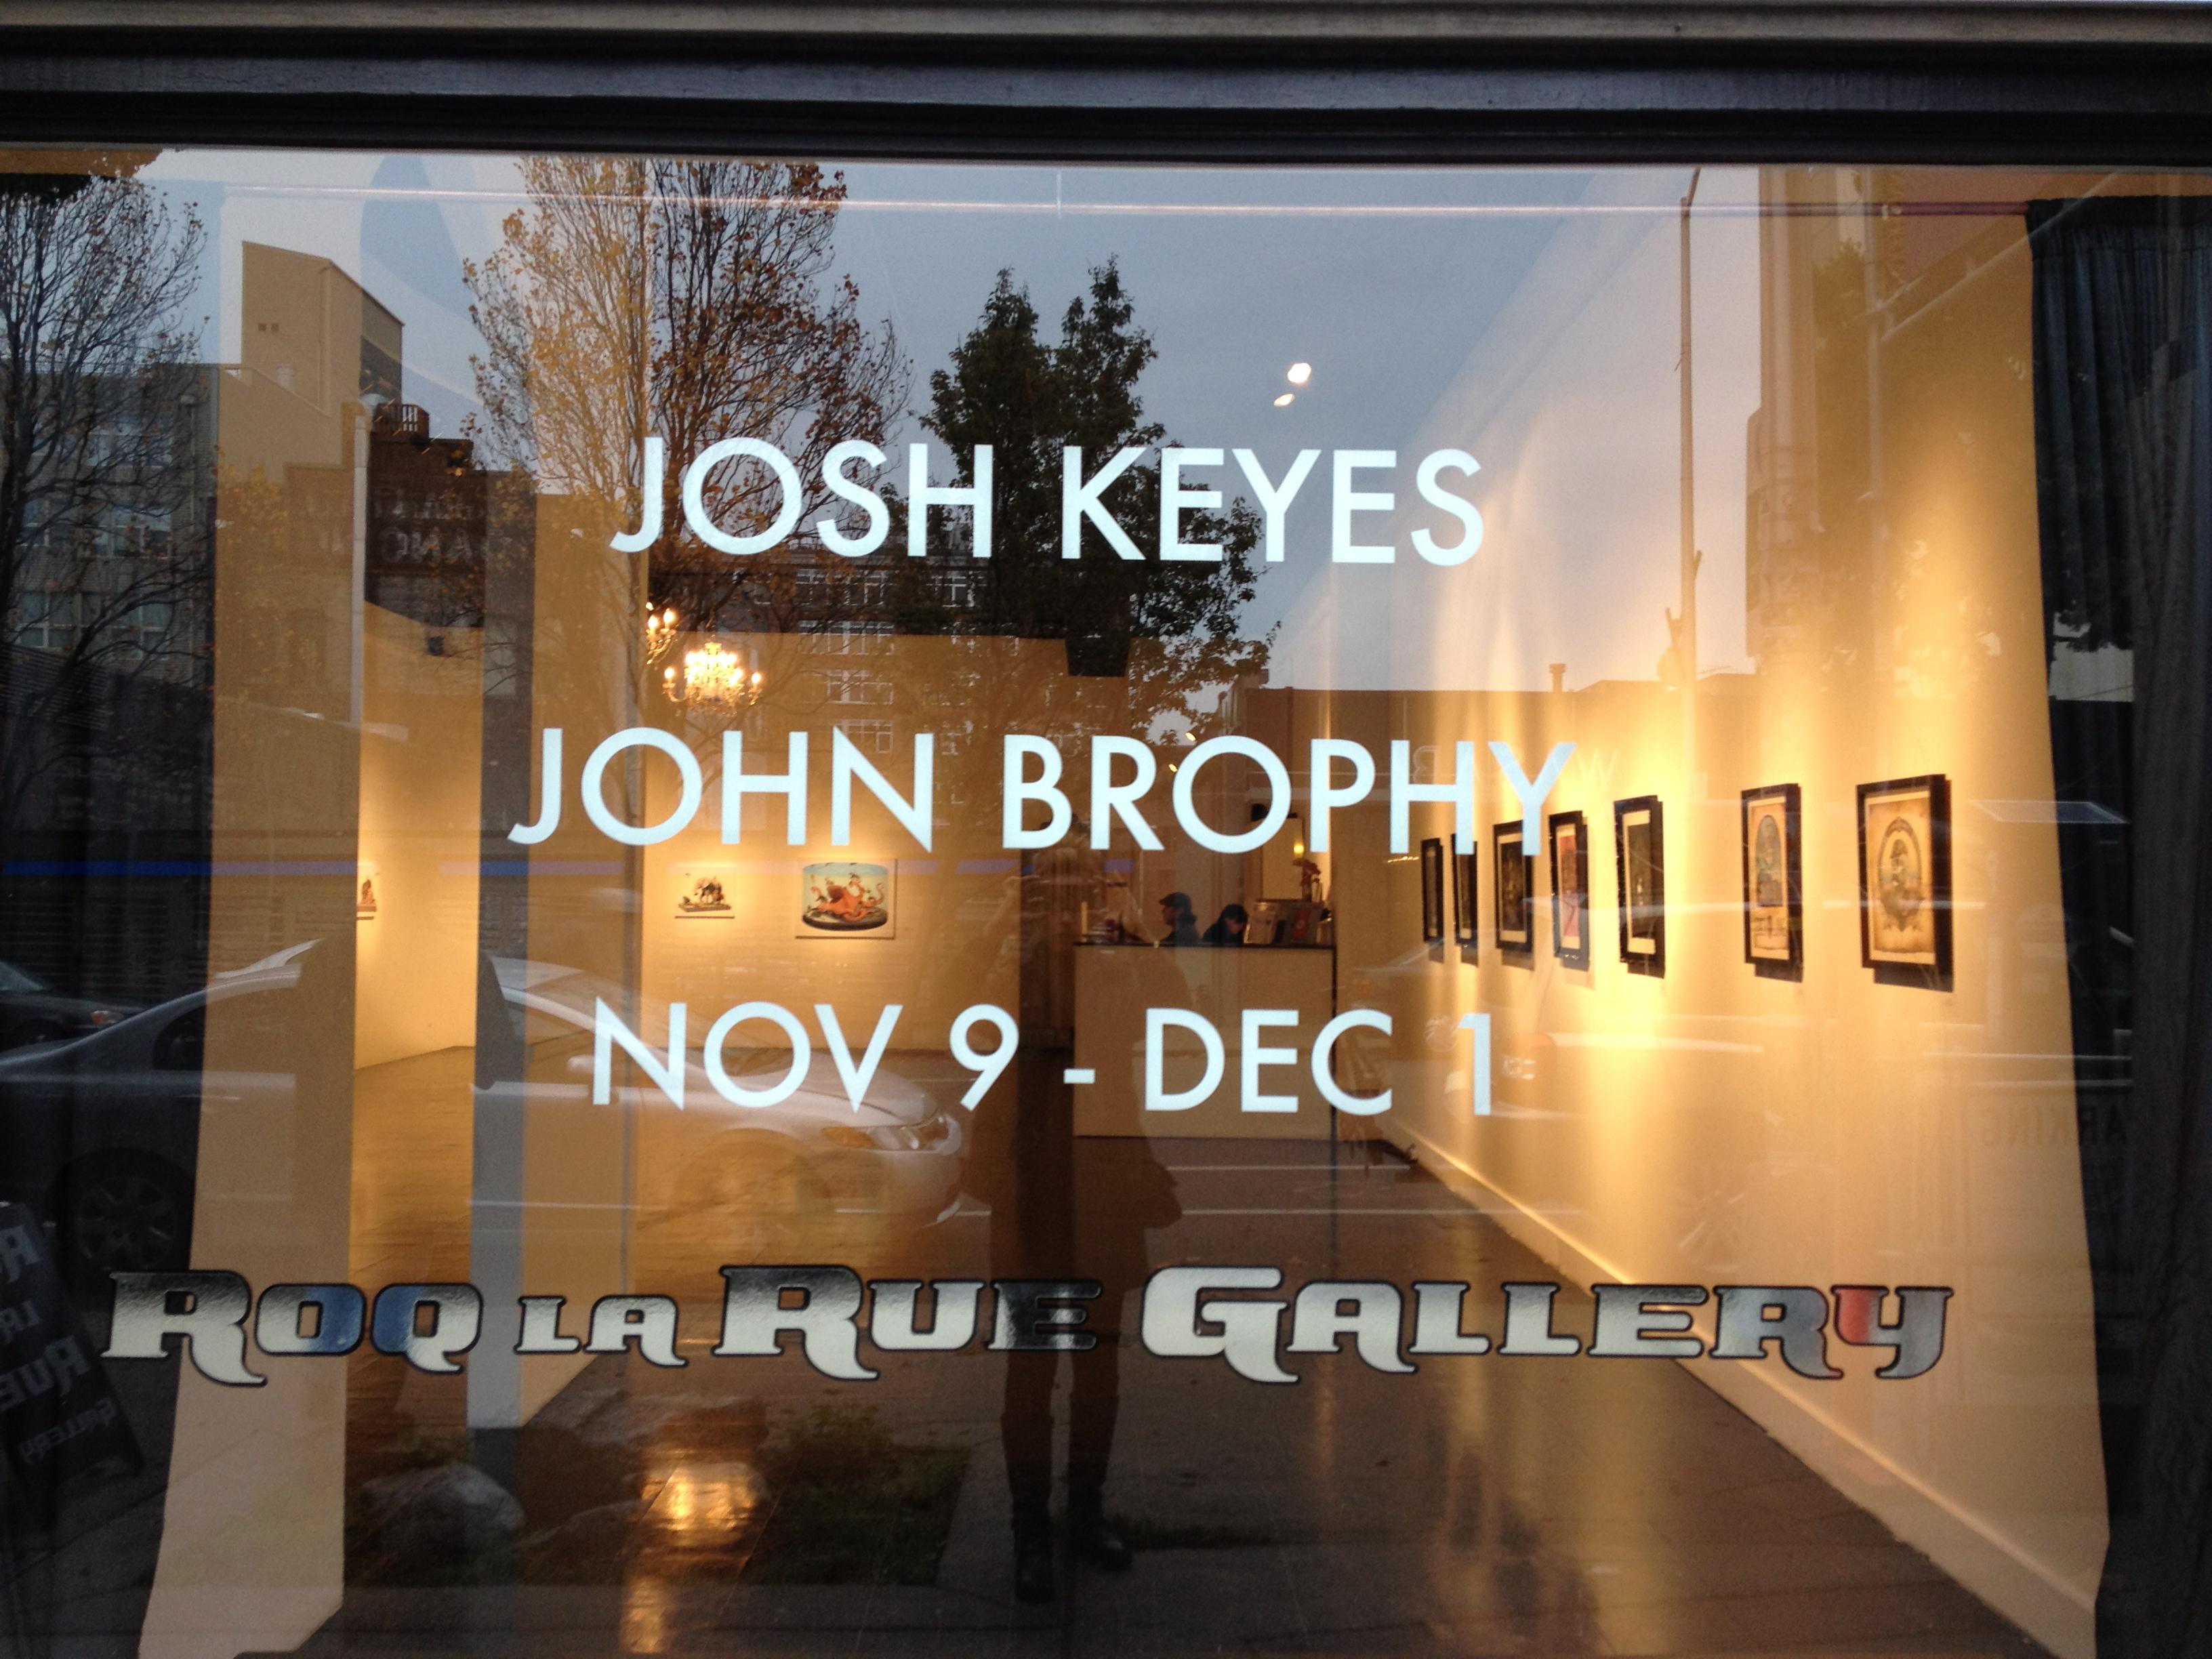 Josh Keyes and John Brophy at Roq La Rue Gallery, November 2012